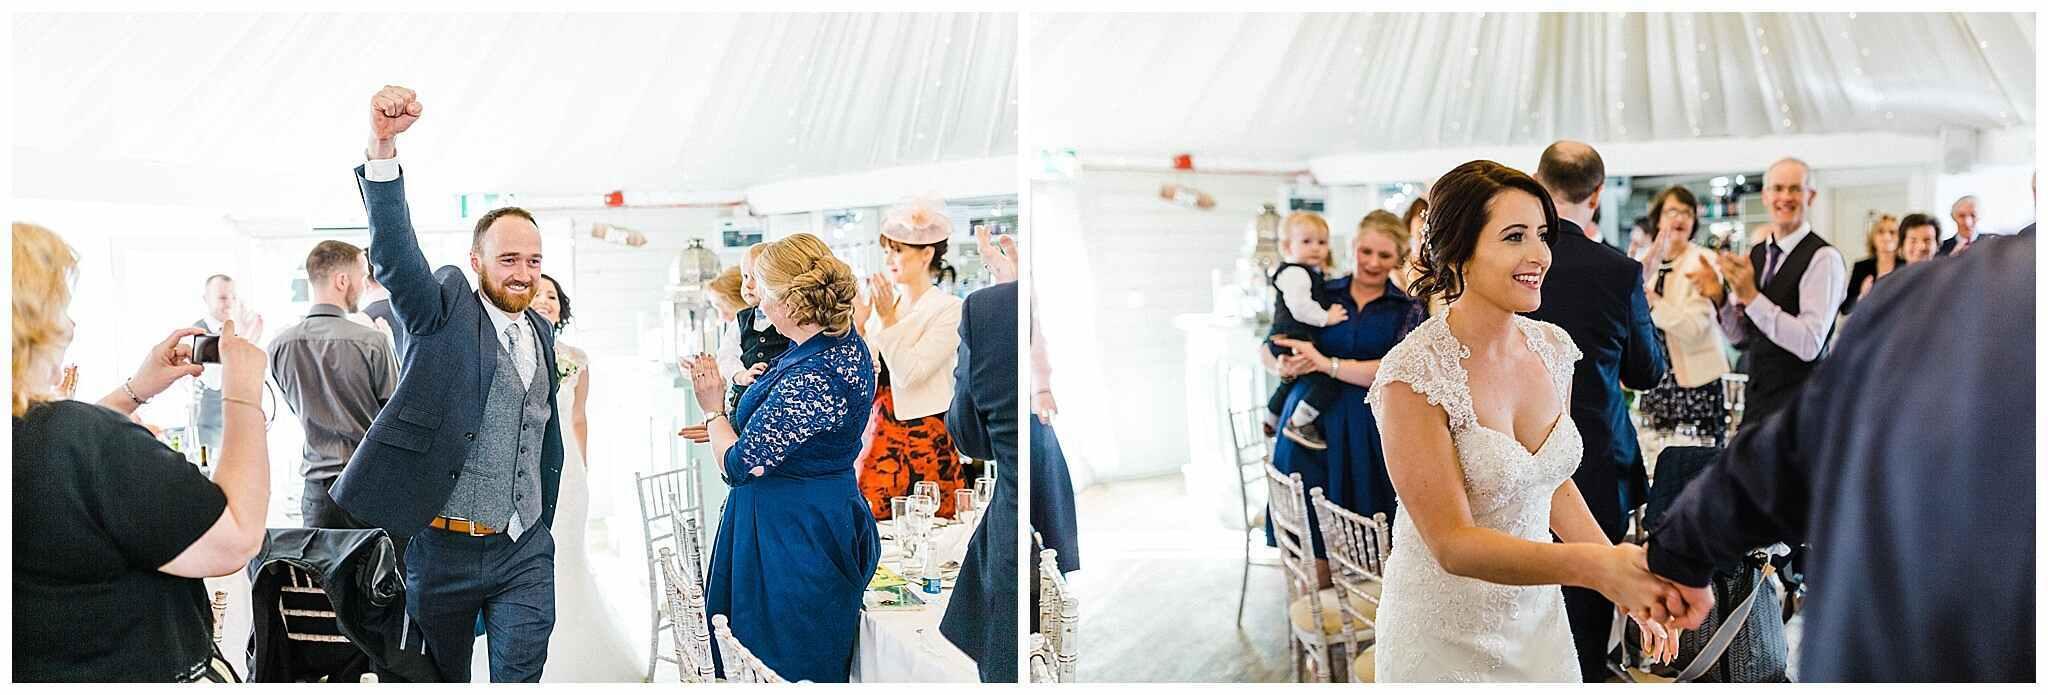 Nicola + Brendan's Wedding at the Millhouse Slane 74